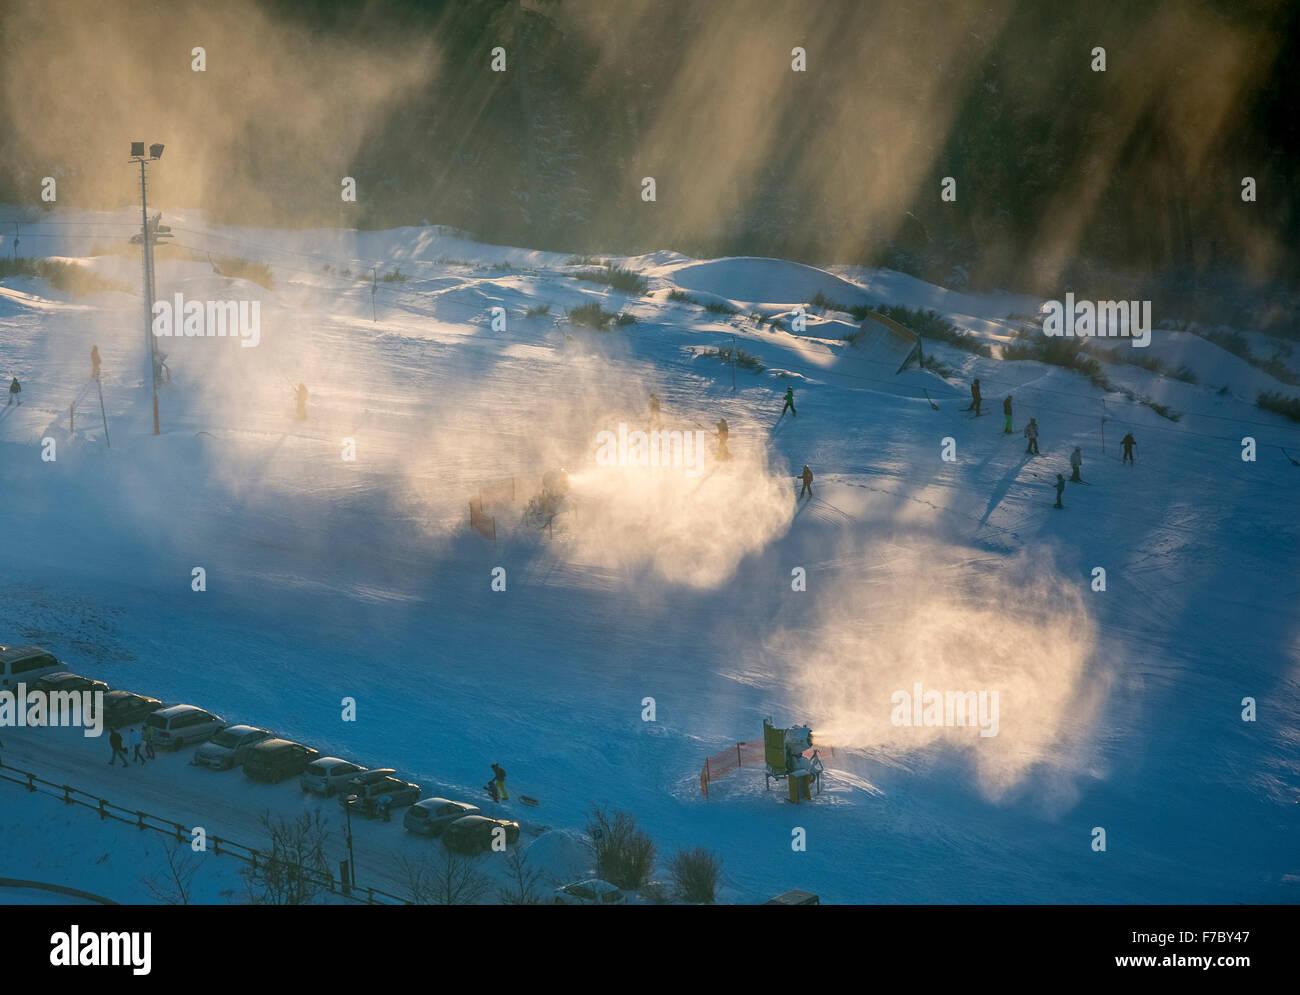 Snow cannons in use, Winterberg, Hochsauerlandkreis, downhill skiing Nordrhein-Westfalen, Germany, Europe, Aerial Stock Photo